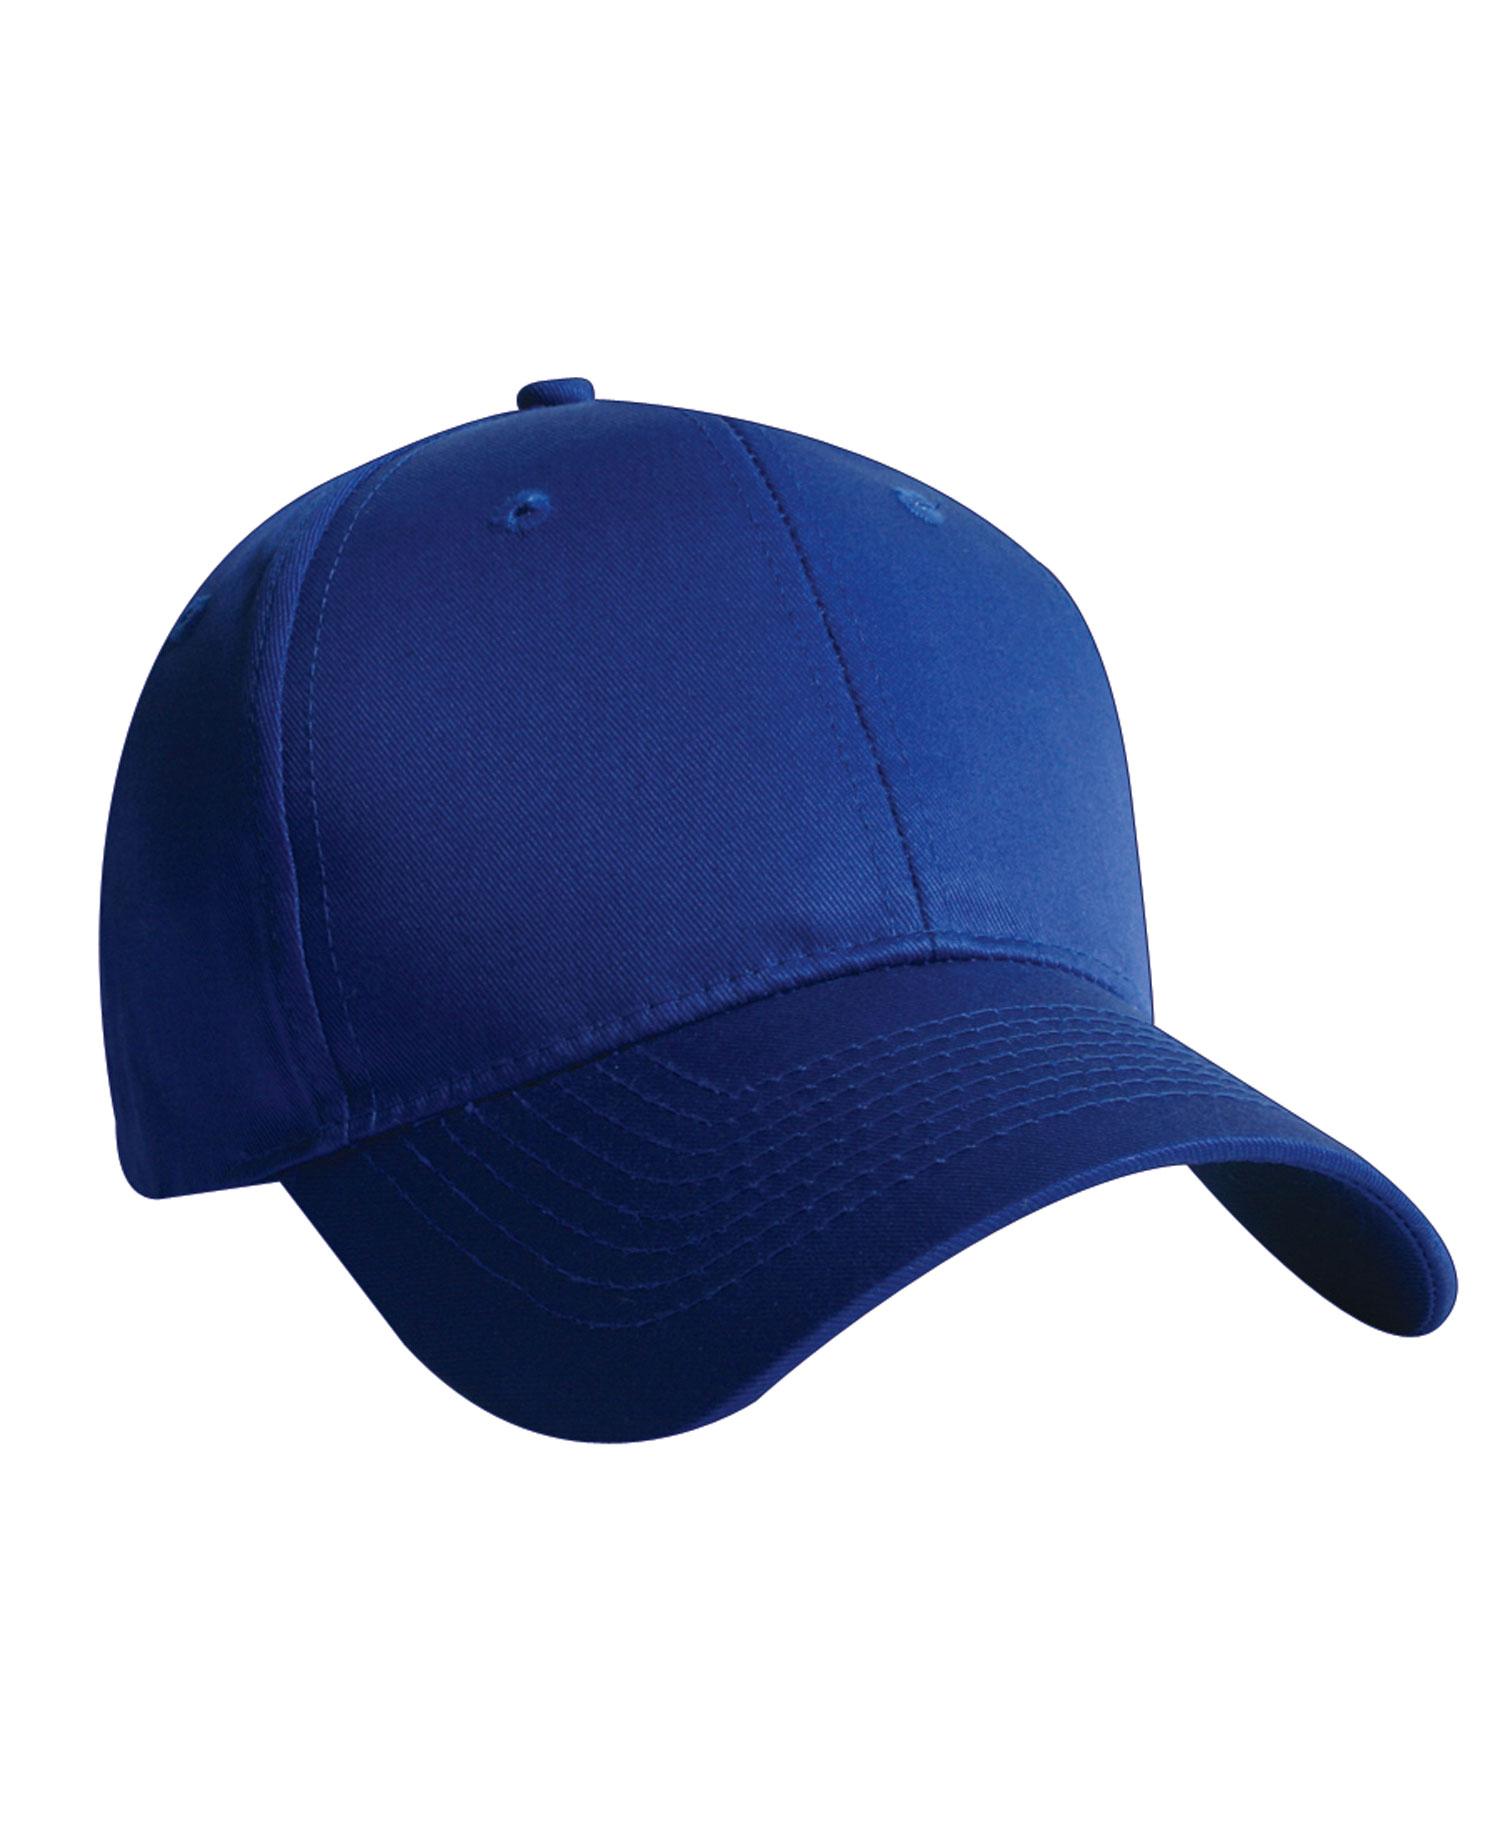 KC Caps - KC6000 Const. Cotton Twill Cap  2.02 - Headwear 62470d68b51